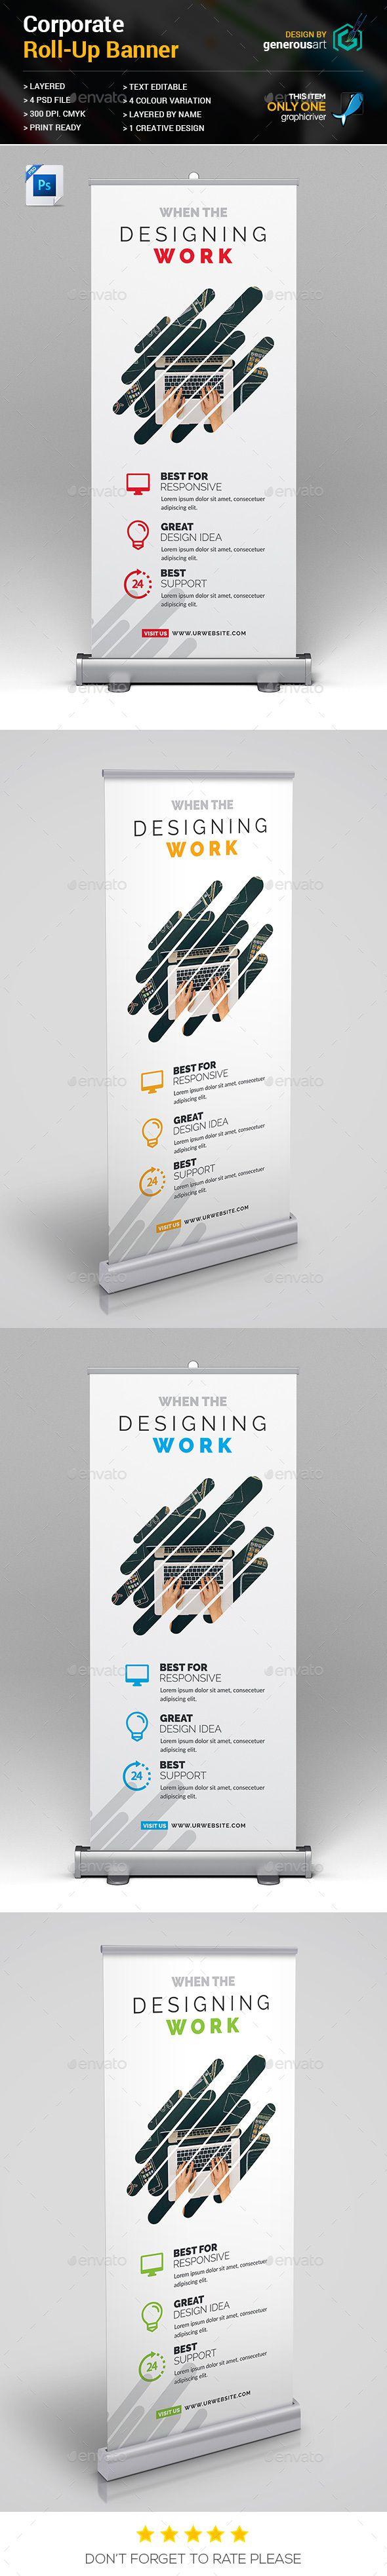 Best 25 Roll up design ideas only on Pinterest